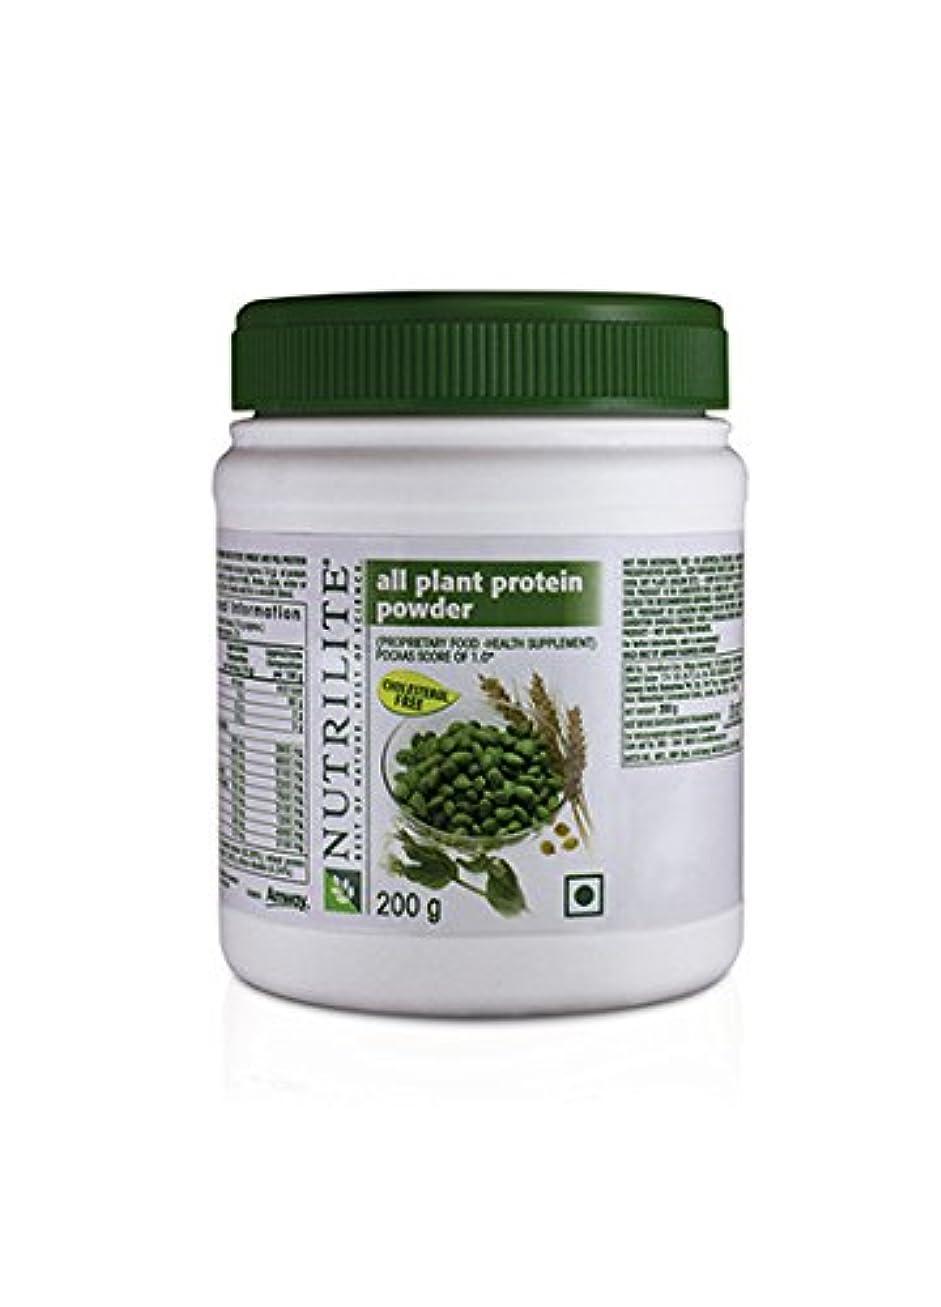 Nutriliteすべて植物プロテイン( 200ミリグラム)